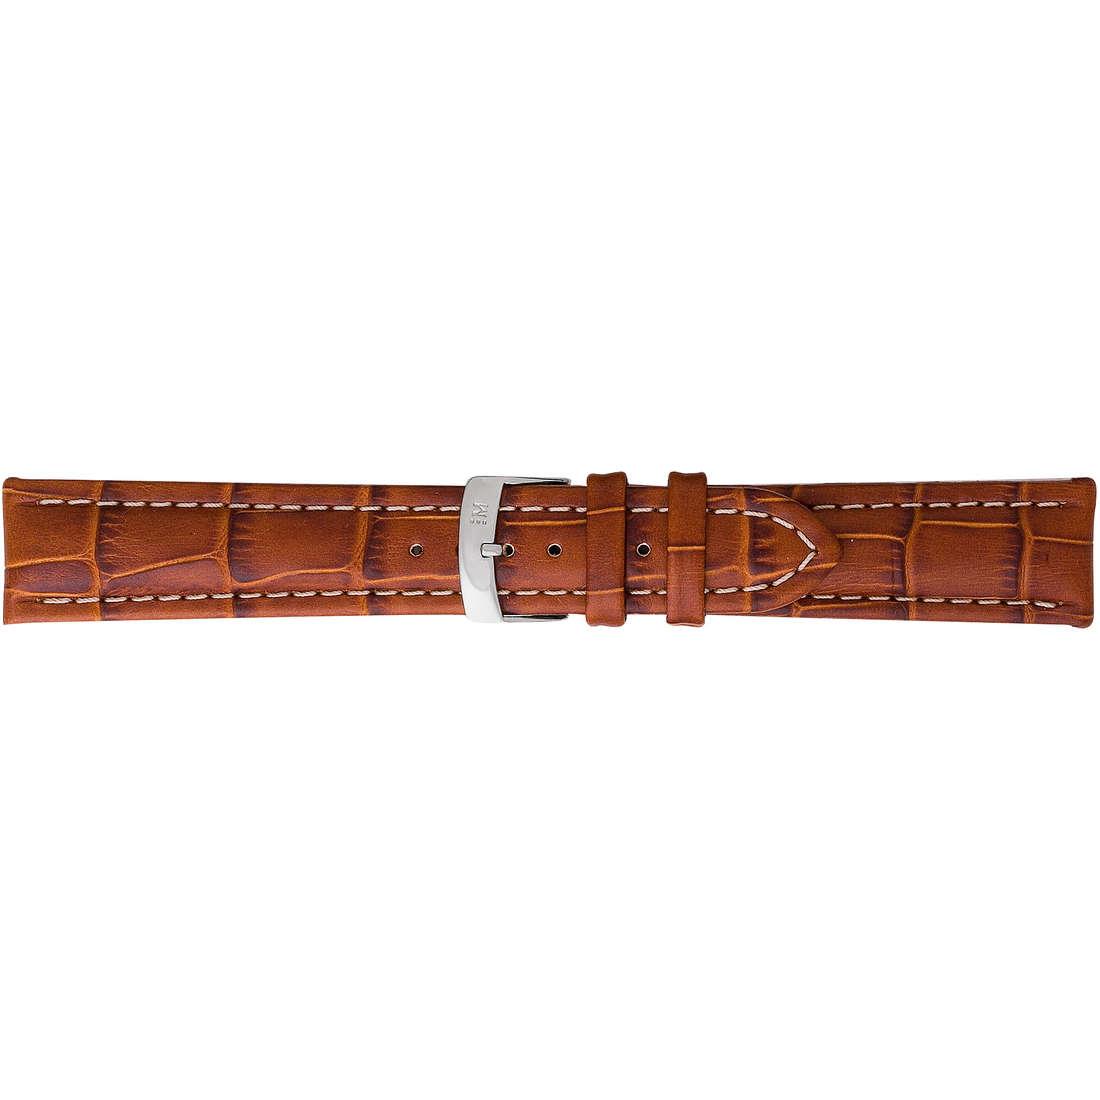 watch watch bands watch straps man Morellato Morellato 1930 A01U3252480041CR24